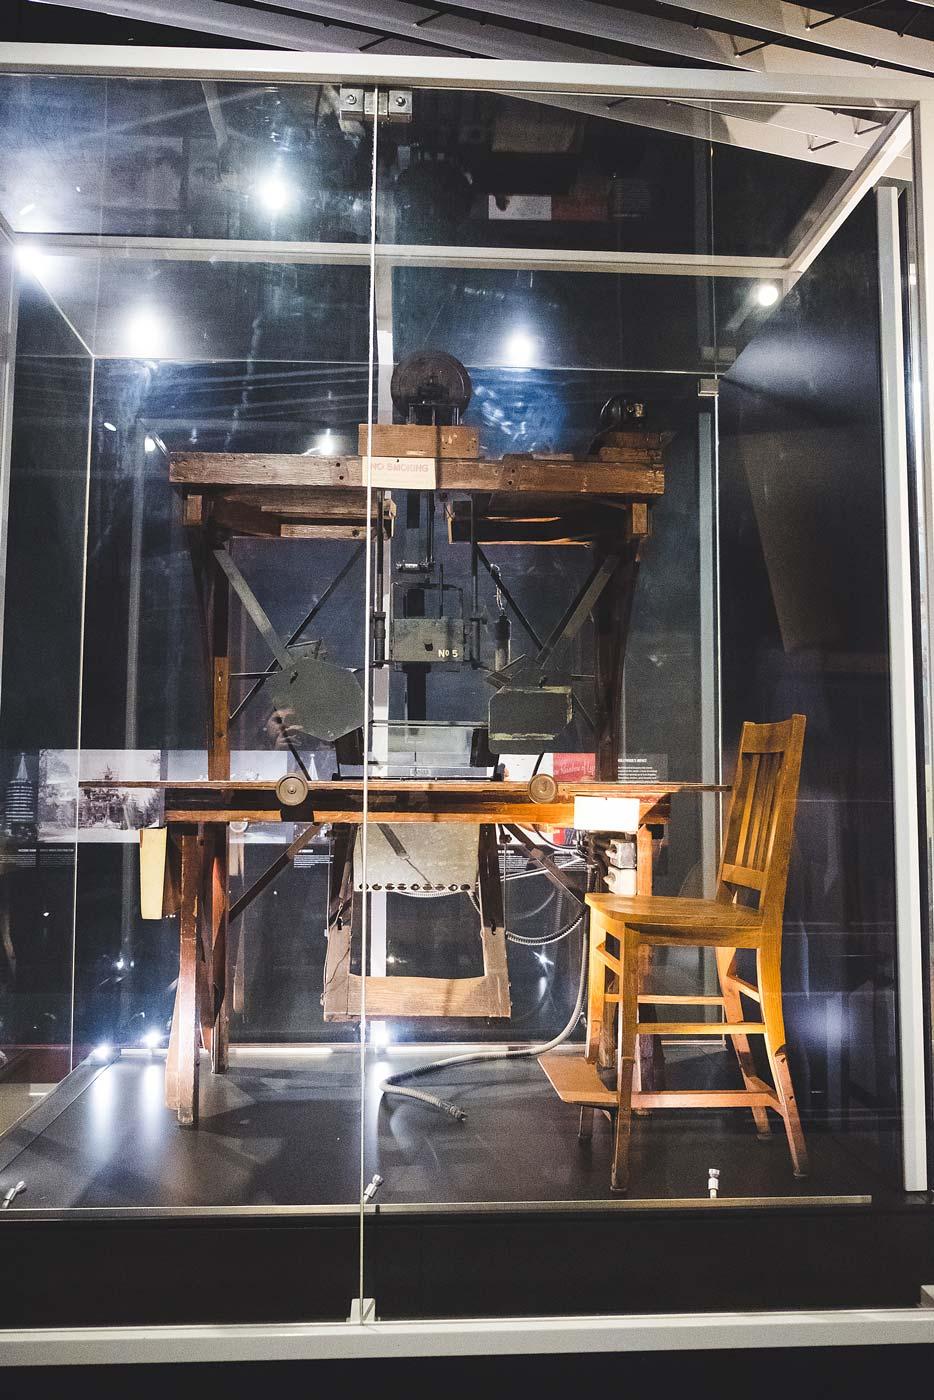 sNatural-History-Museum---Feb-2017-44.jpg